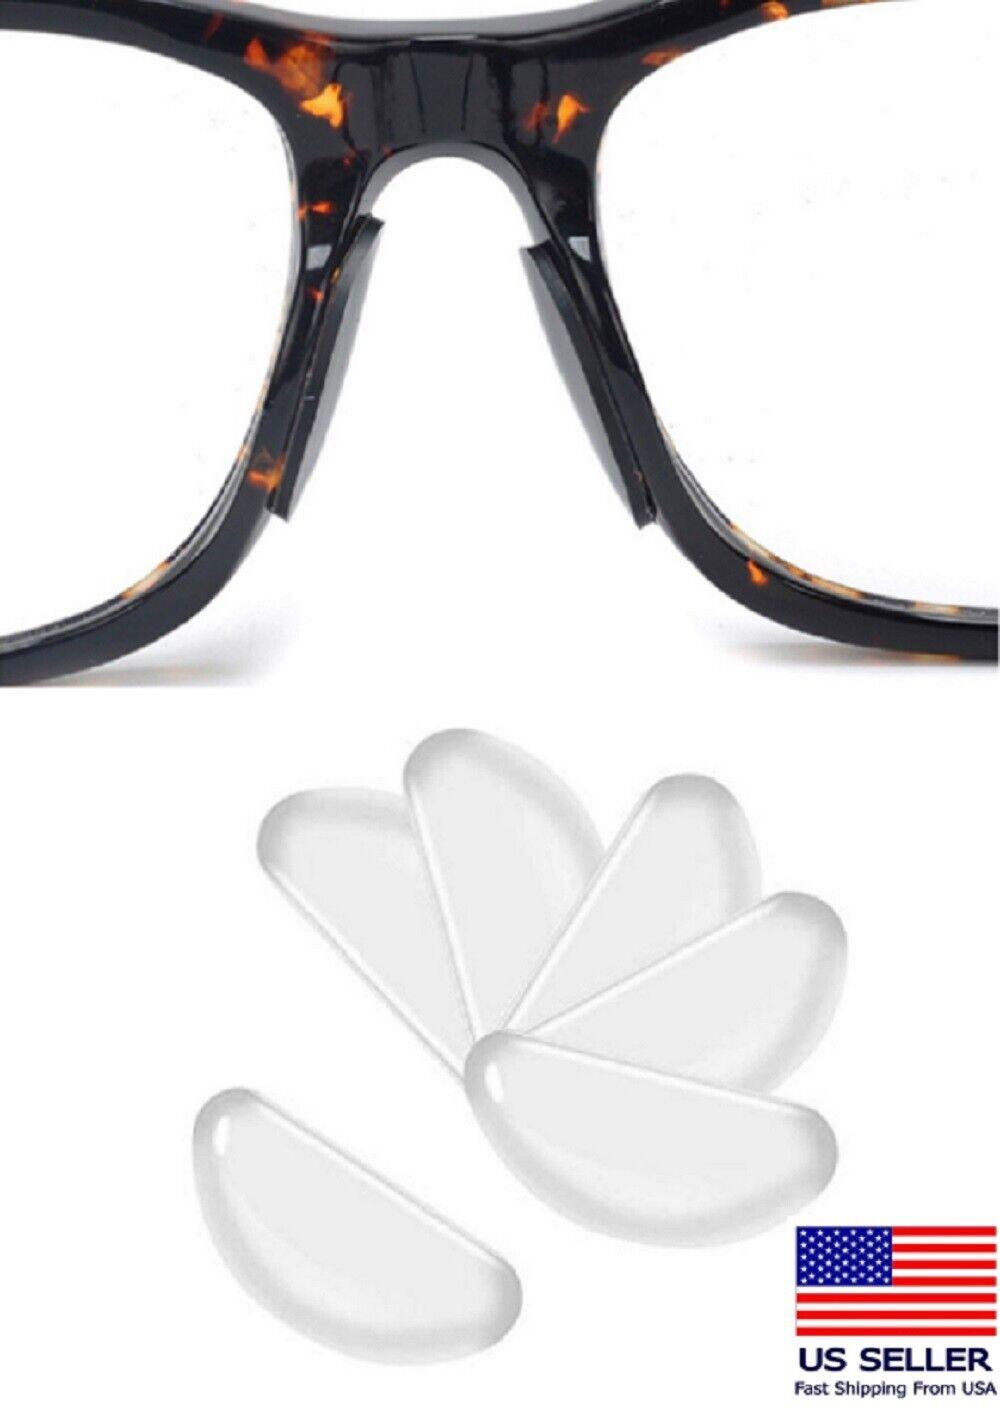 5 Pairs Anti-slip silicone Stick On Nose Pads For Eyeglasses Sunglasses Glasses Eyeglasses Parts